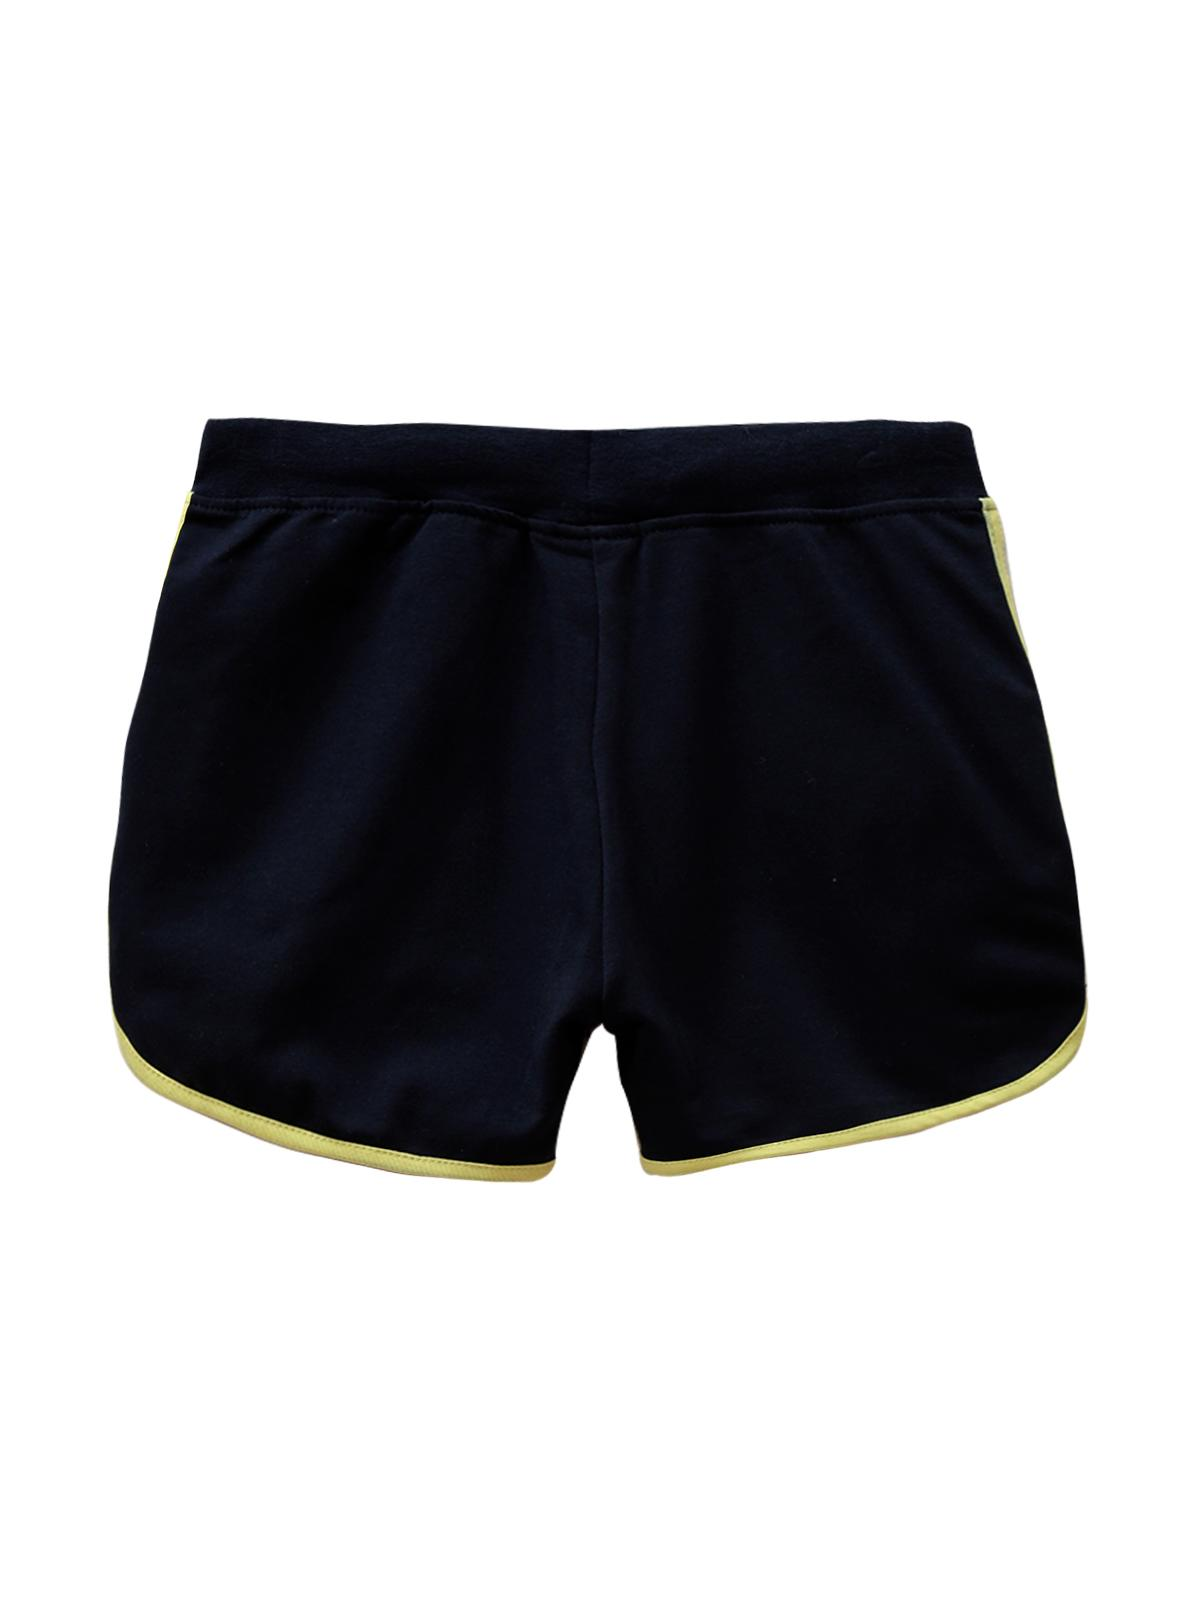 selezione premium 55ffd 156f1 Pantaloncini sportivi con paillettes pink baby | MecShopping